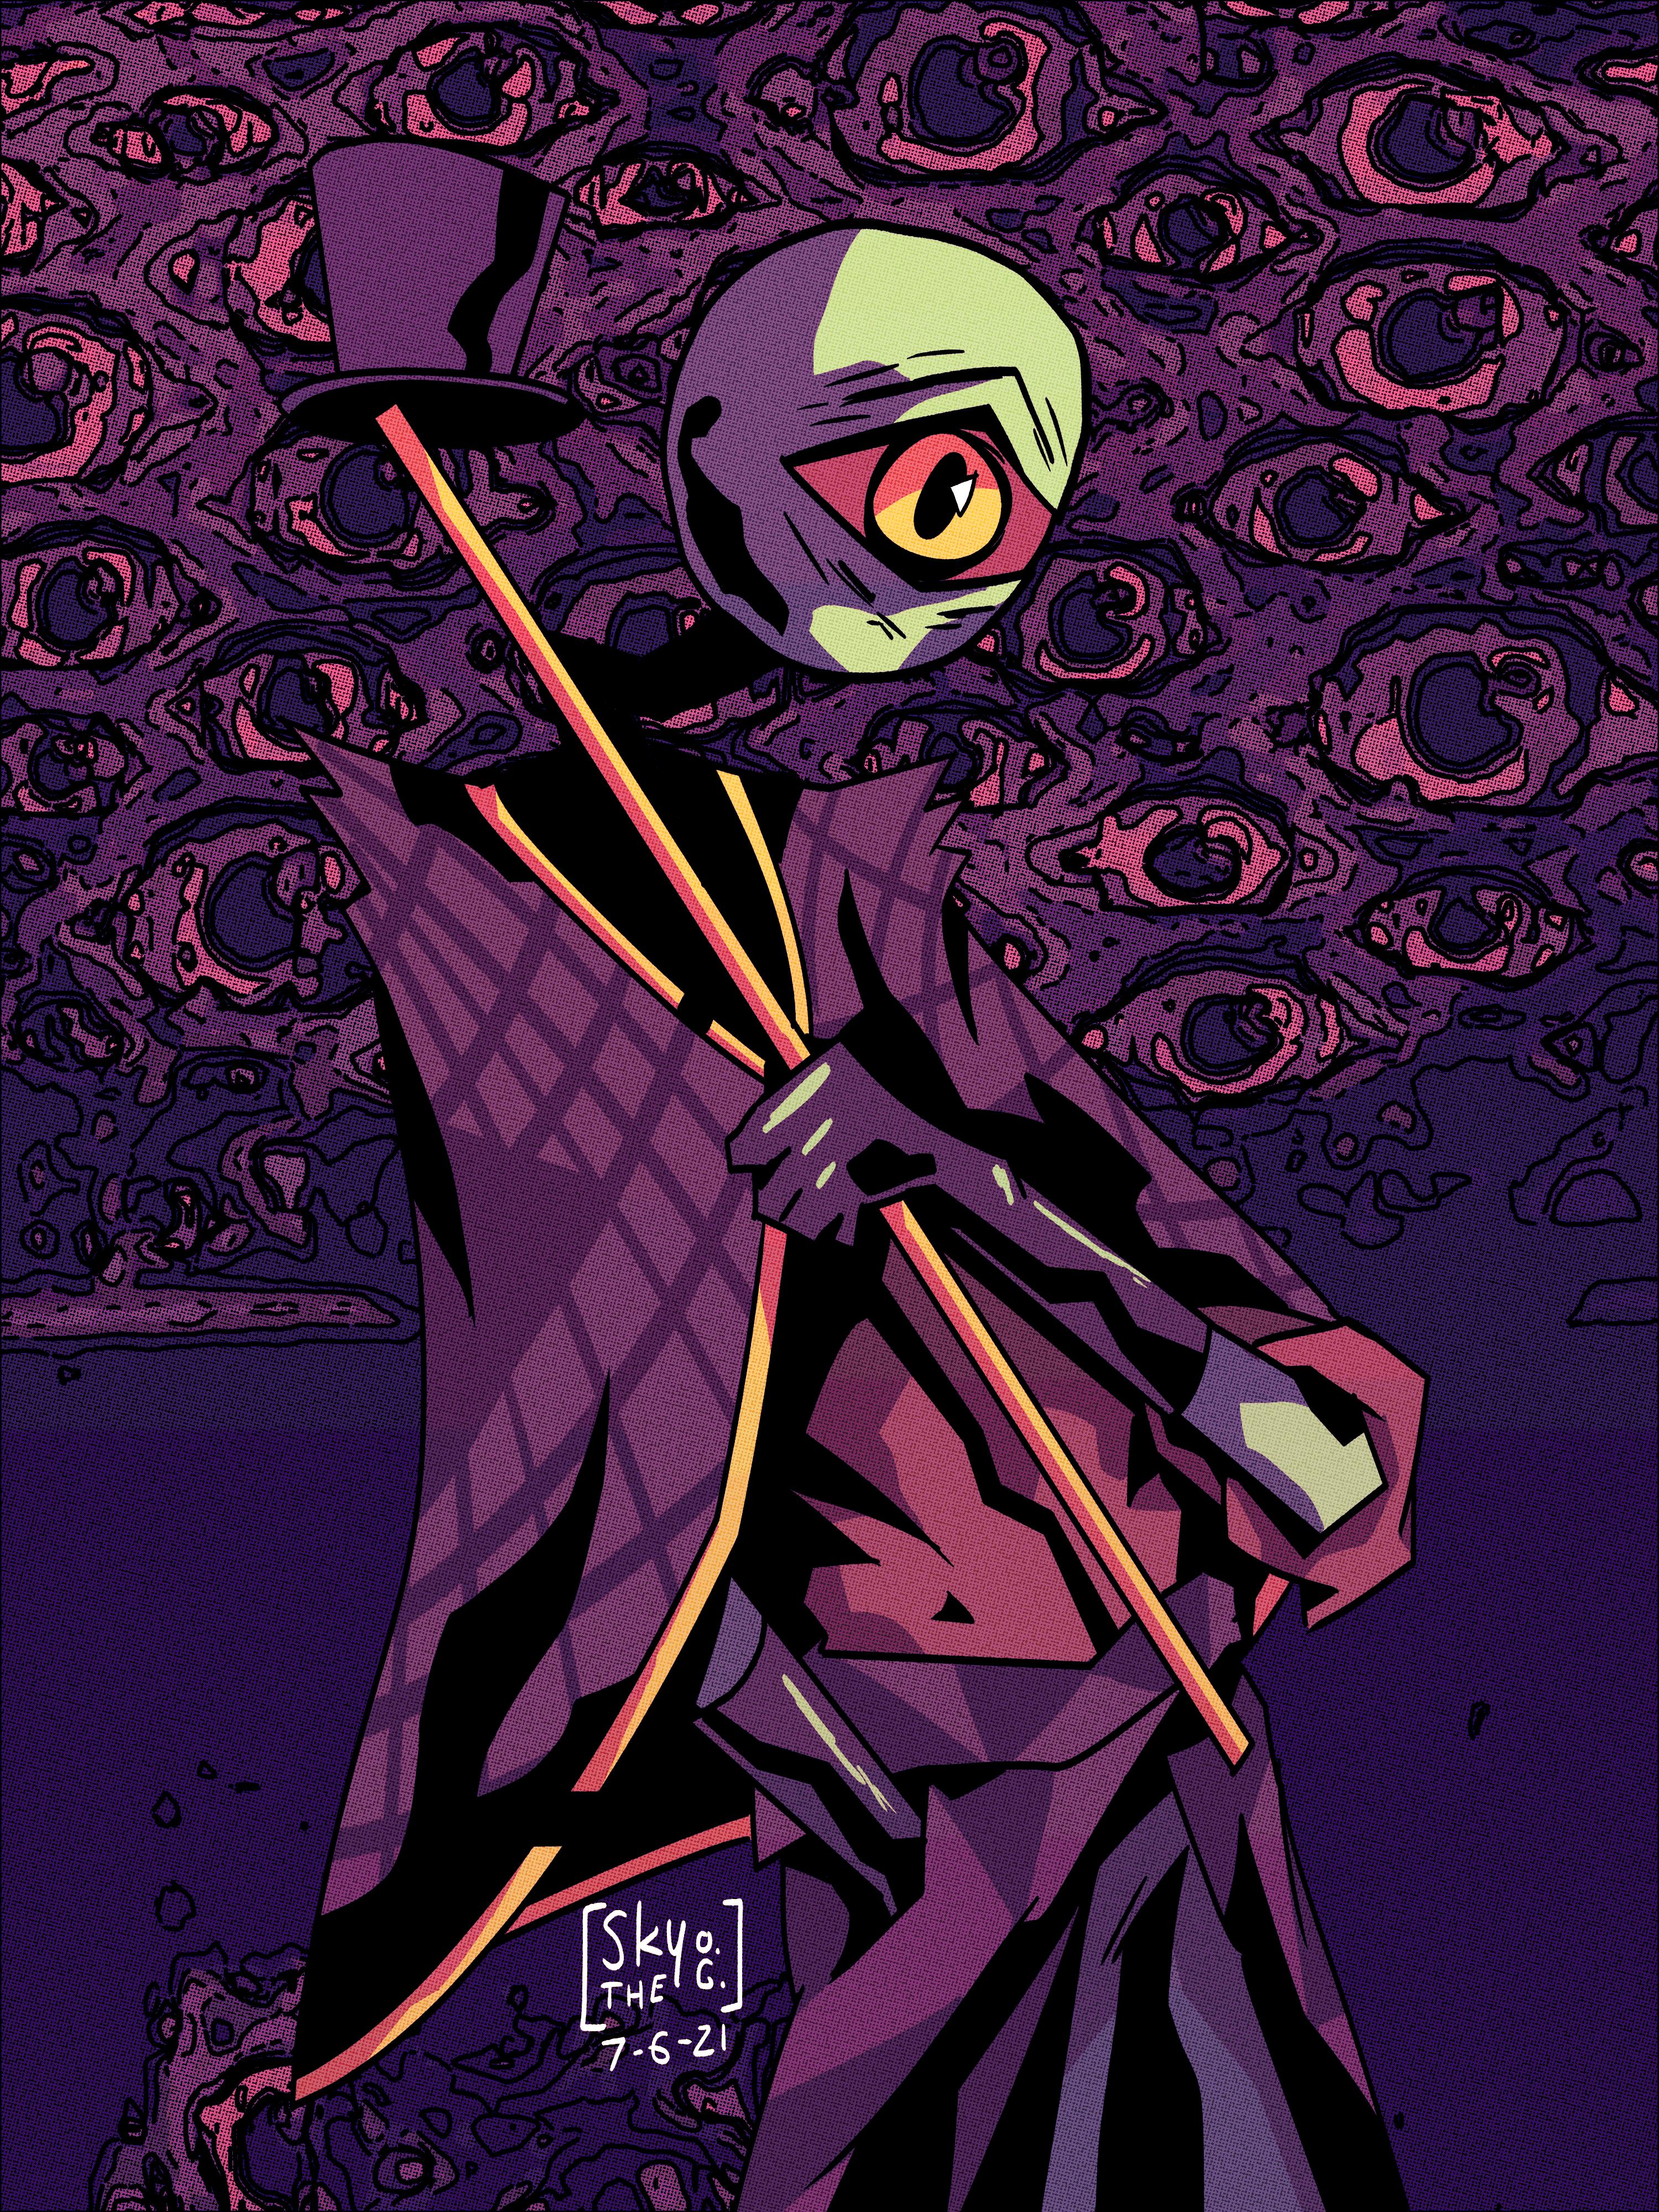 [Artfight 2021] Deeluh